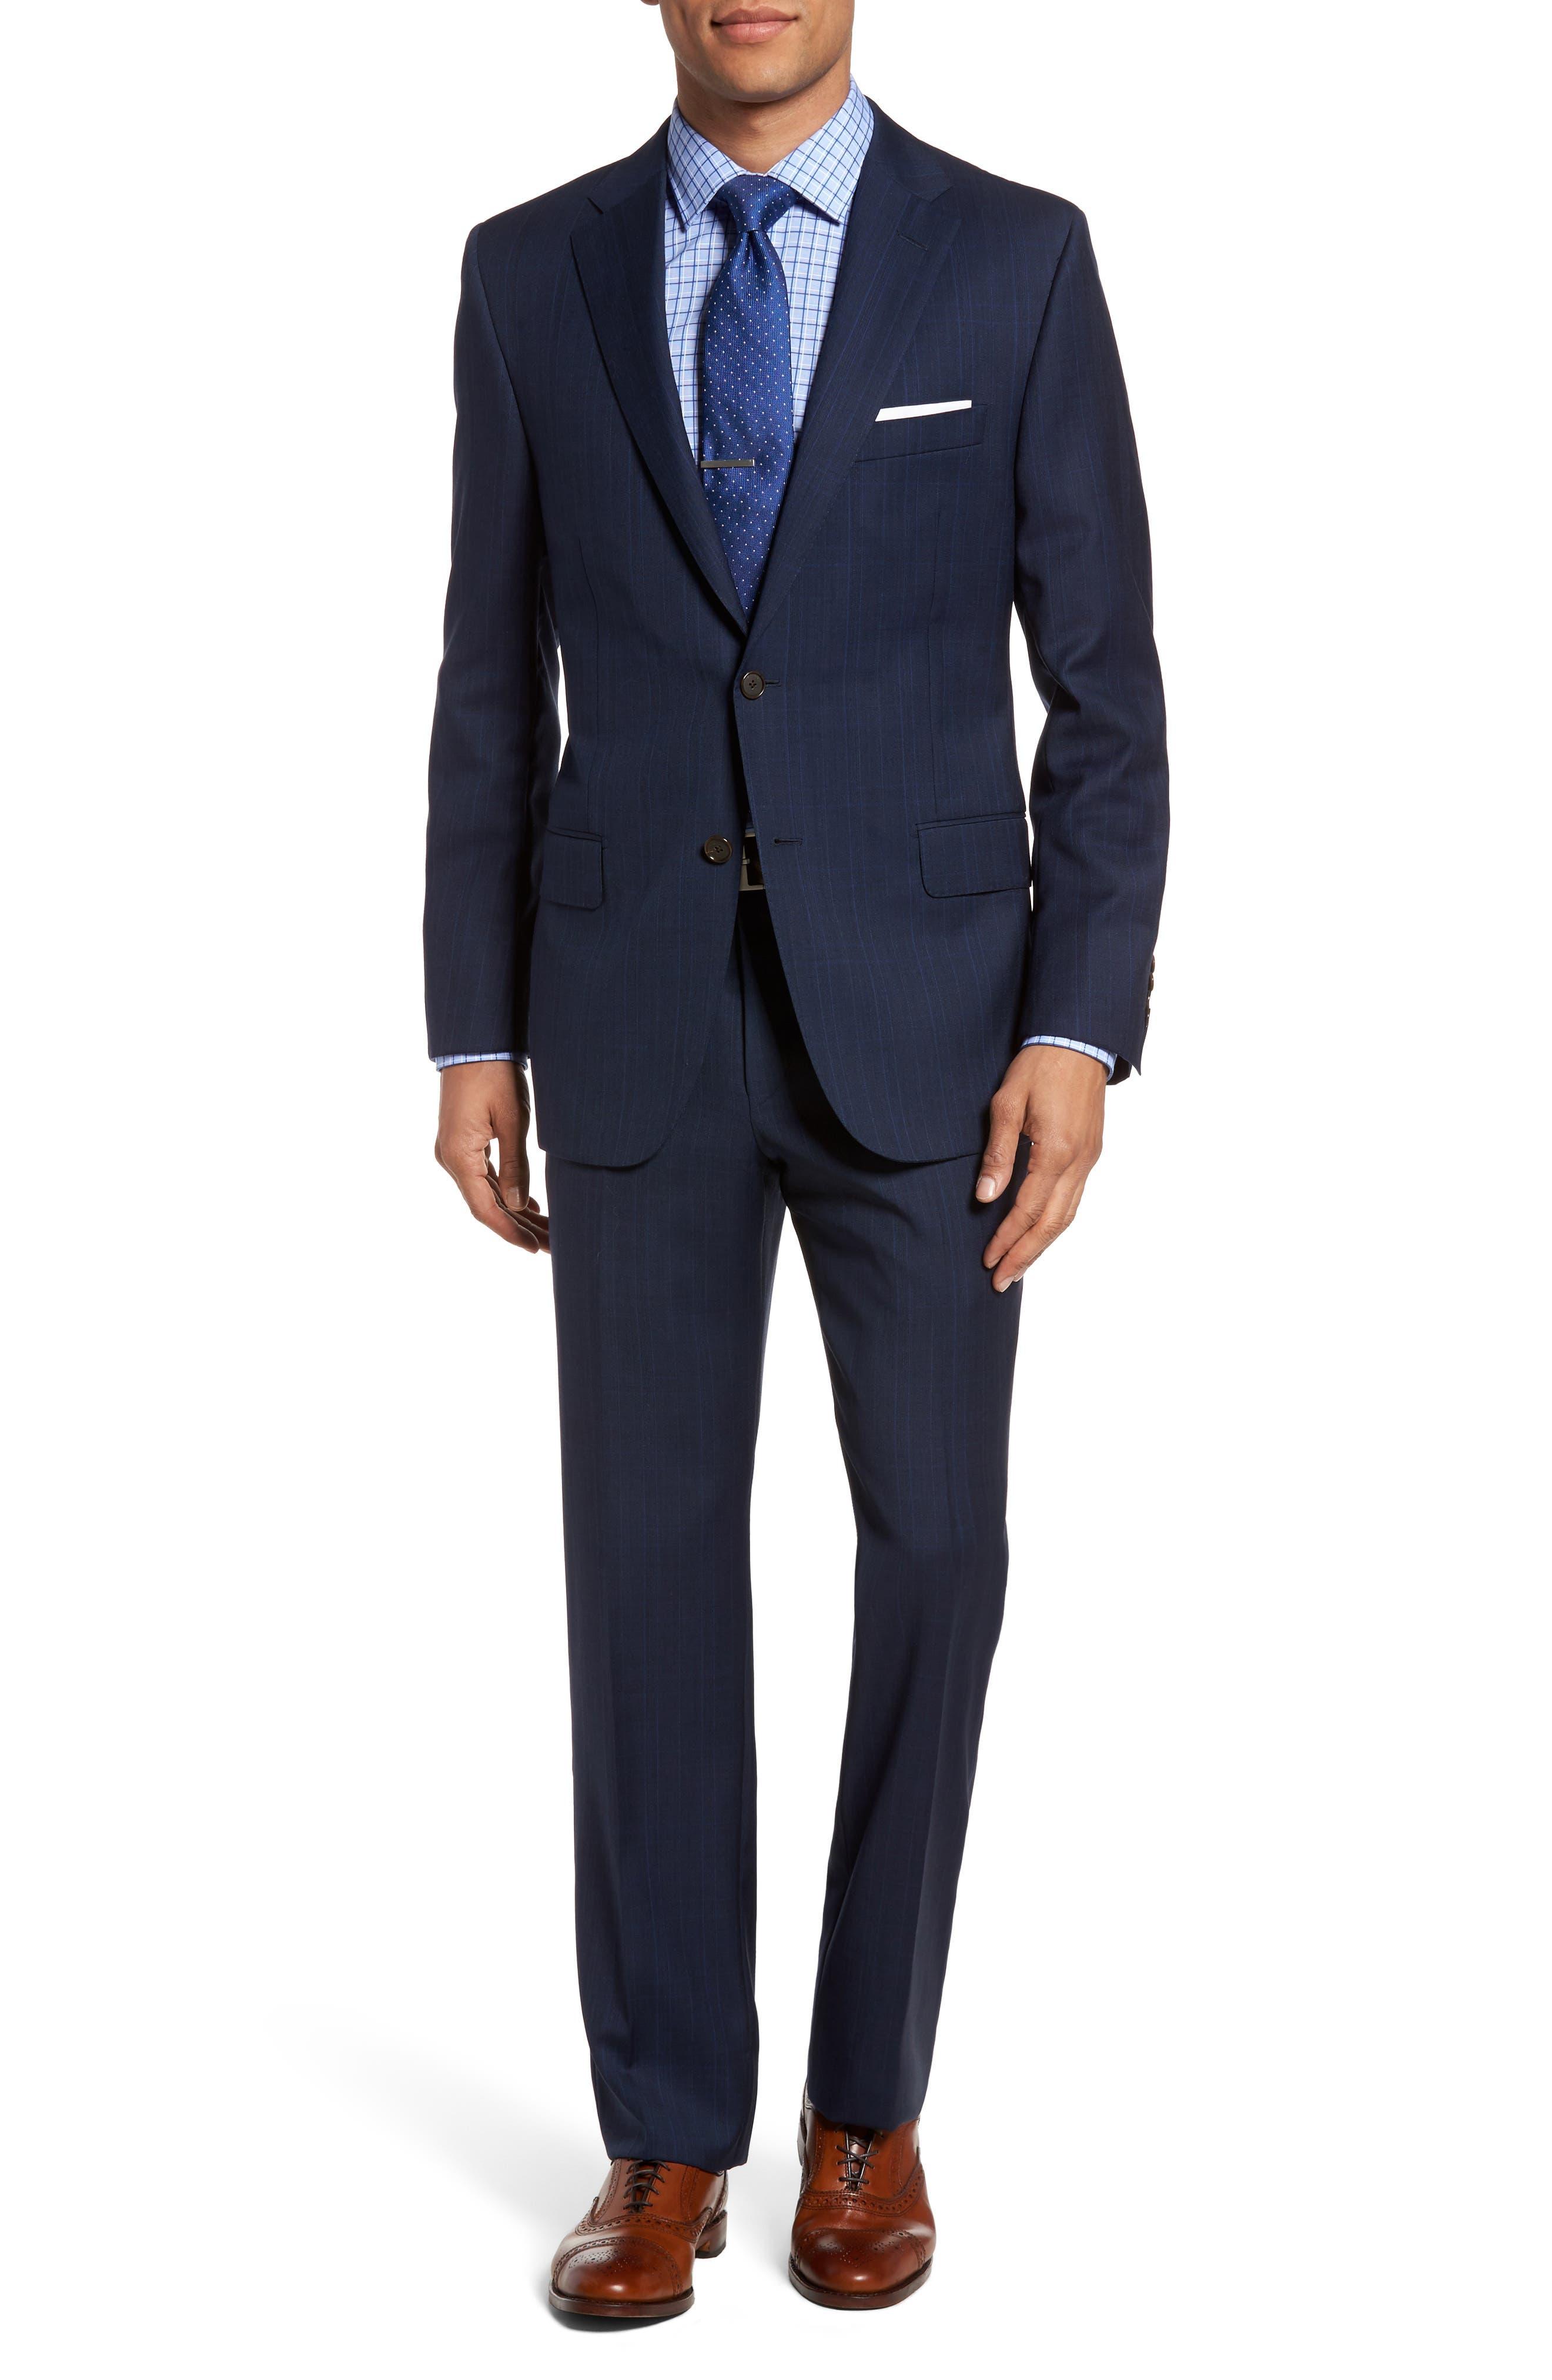 Hickey Freeman B-Series Classic Fit Plaid Wool Suit